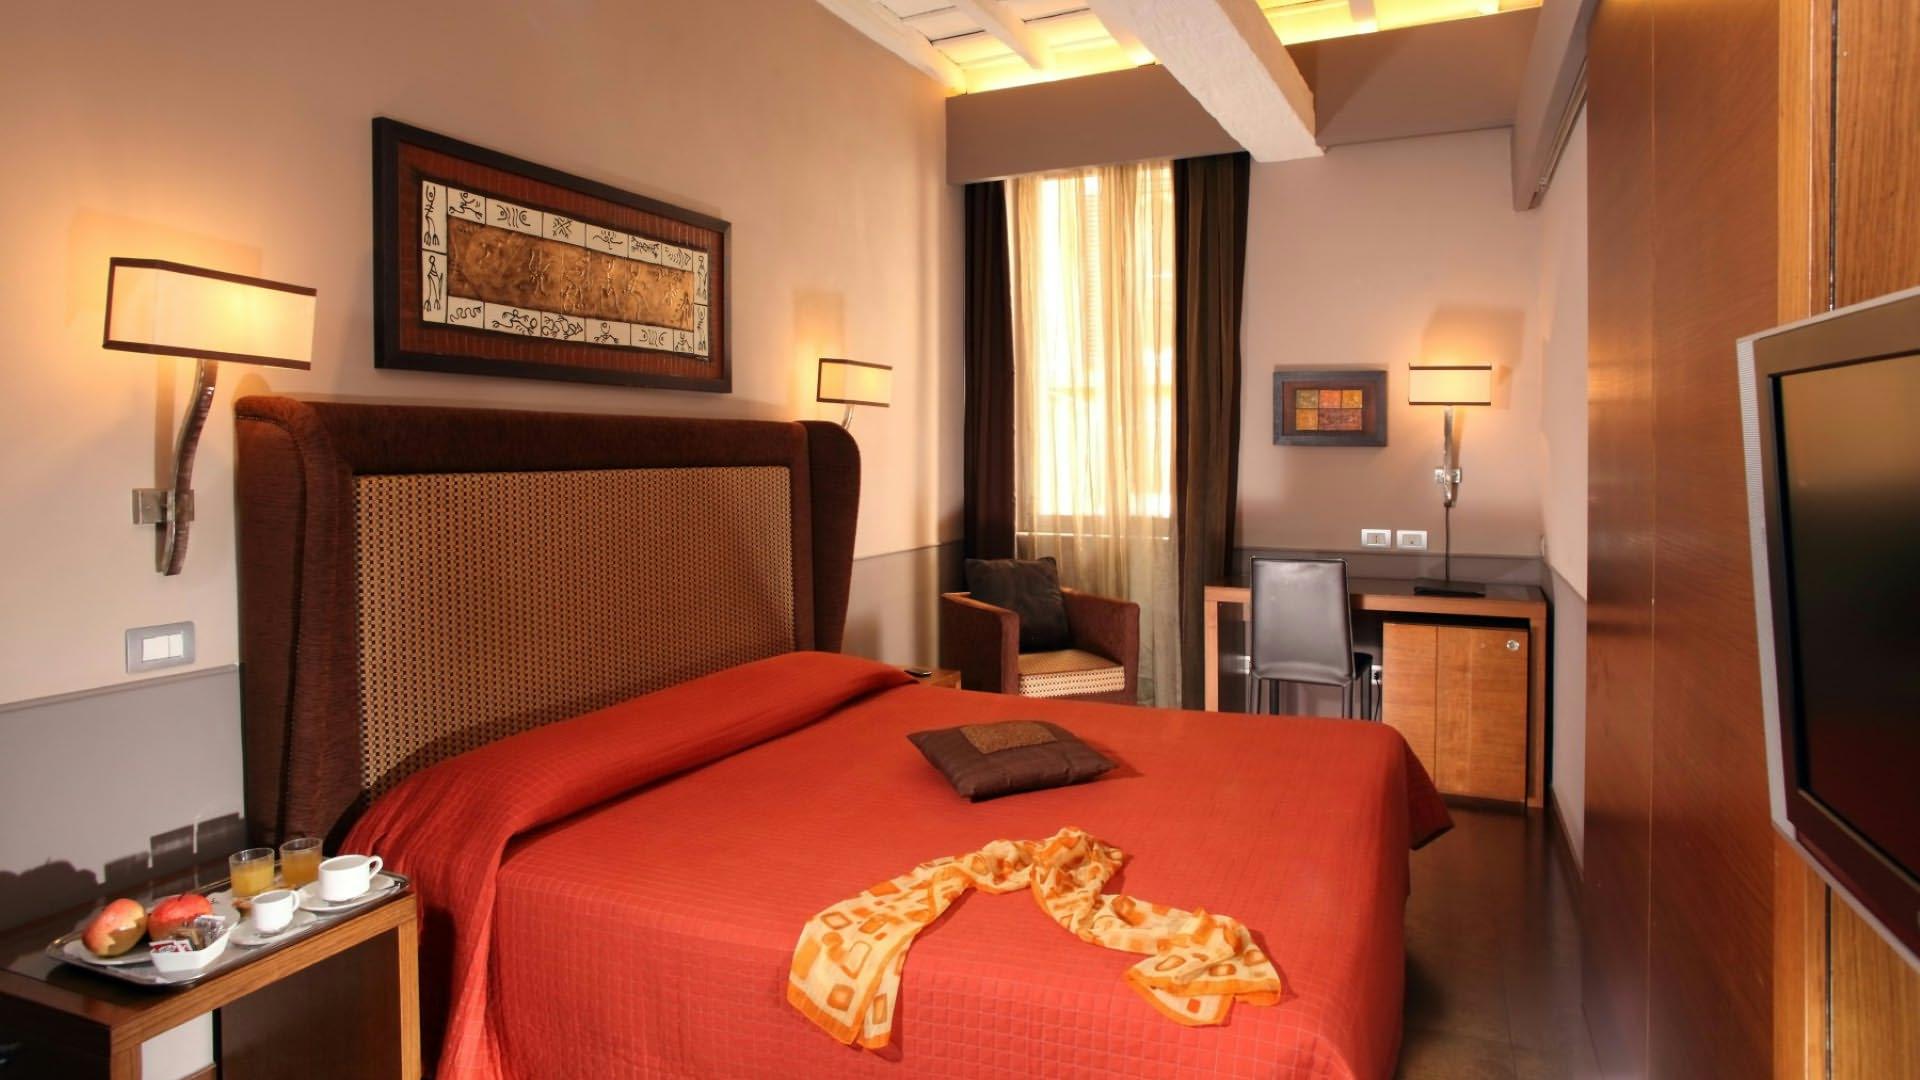 relais-condotti-palace-roma-habitaciones-4